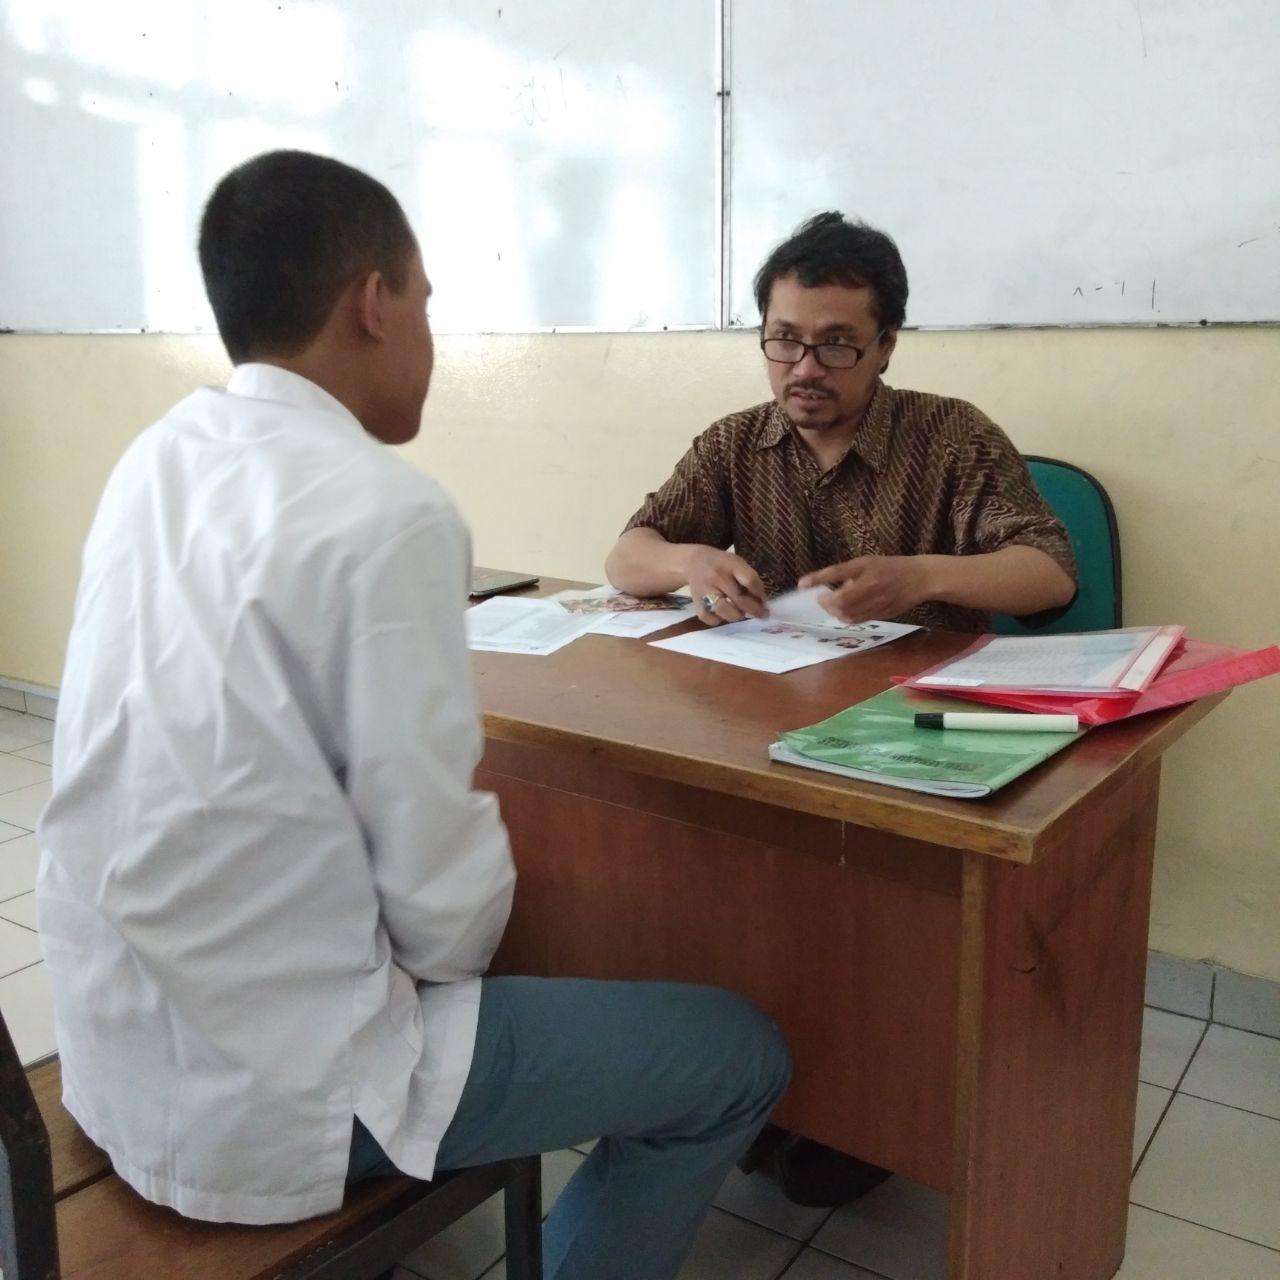 Tes Kecakapan Bahasa Inggris oleh LC Telkom University